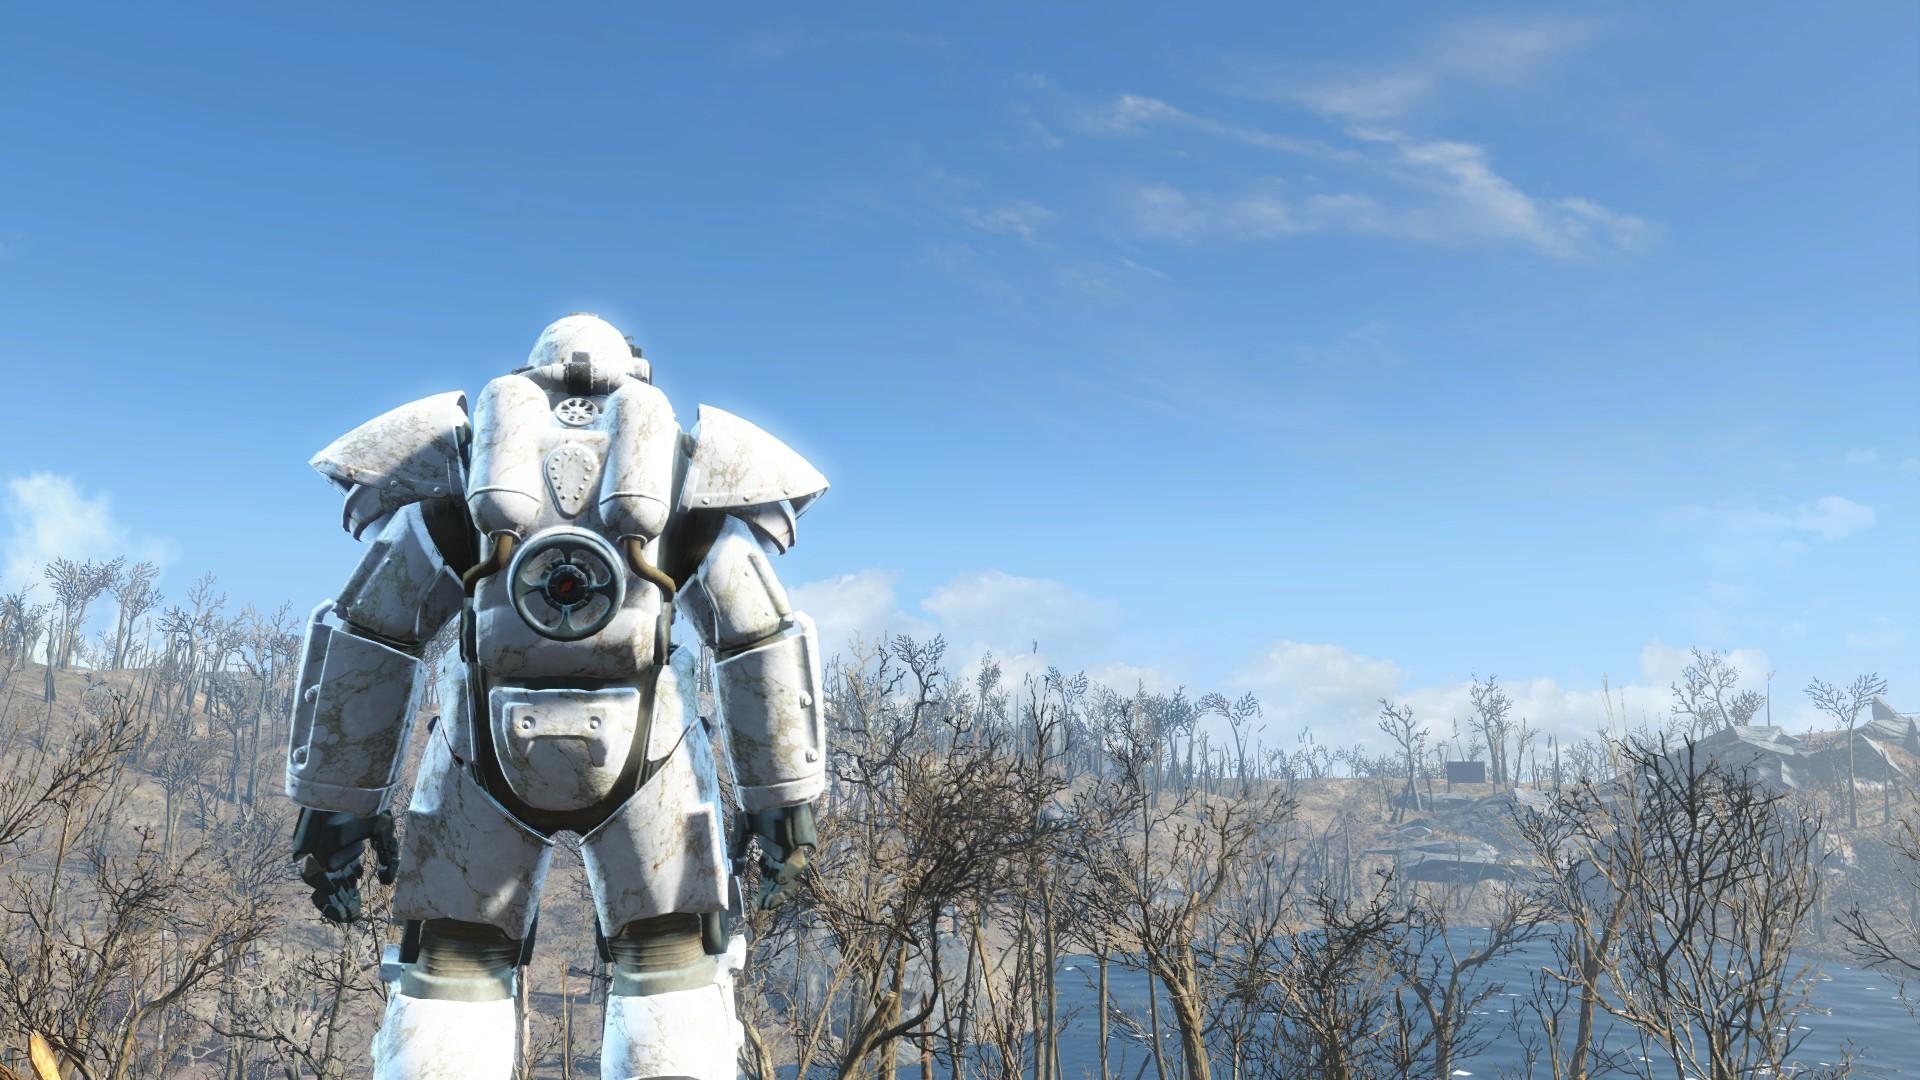 20190420221321_1.jpg - Fallout 4